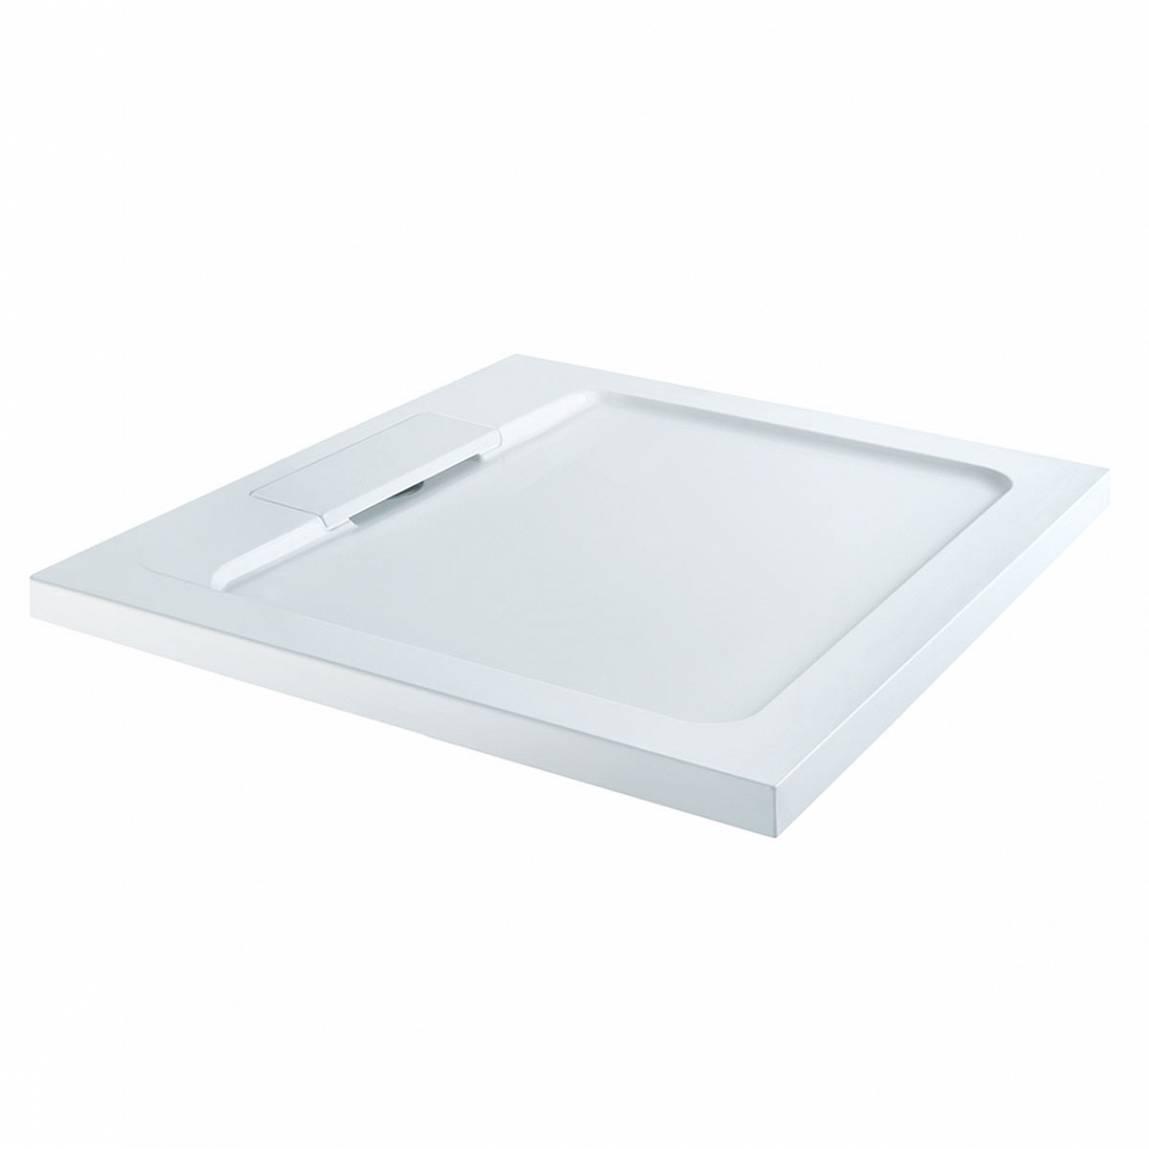 Image of Designer Square Stone Shower Tray 900 x 900